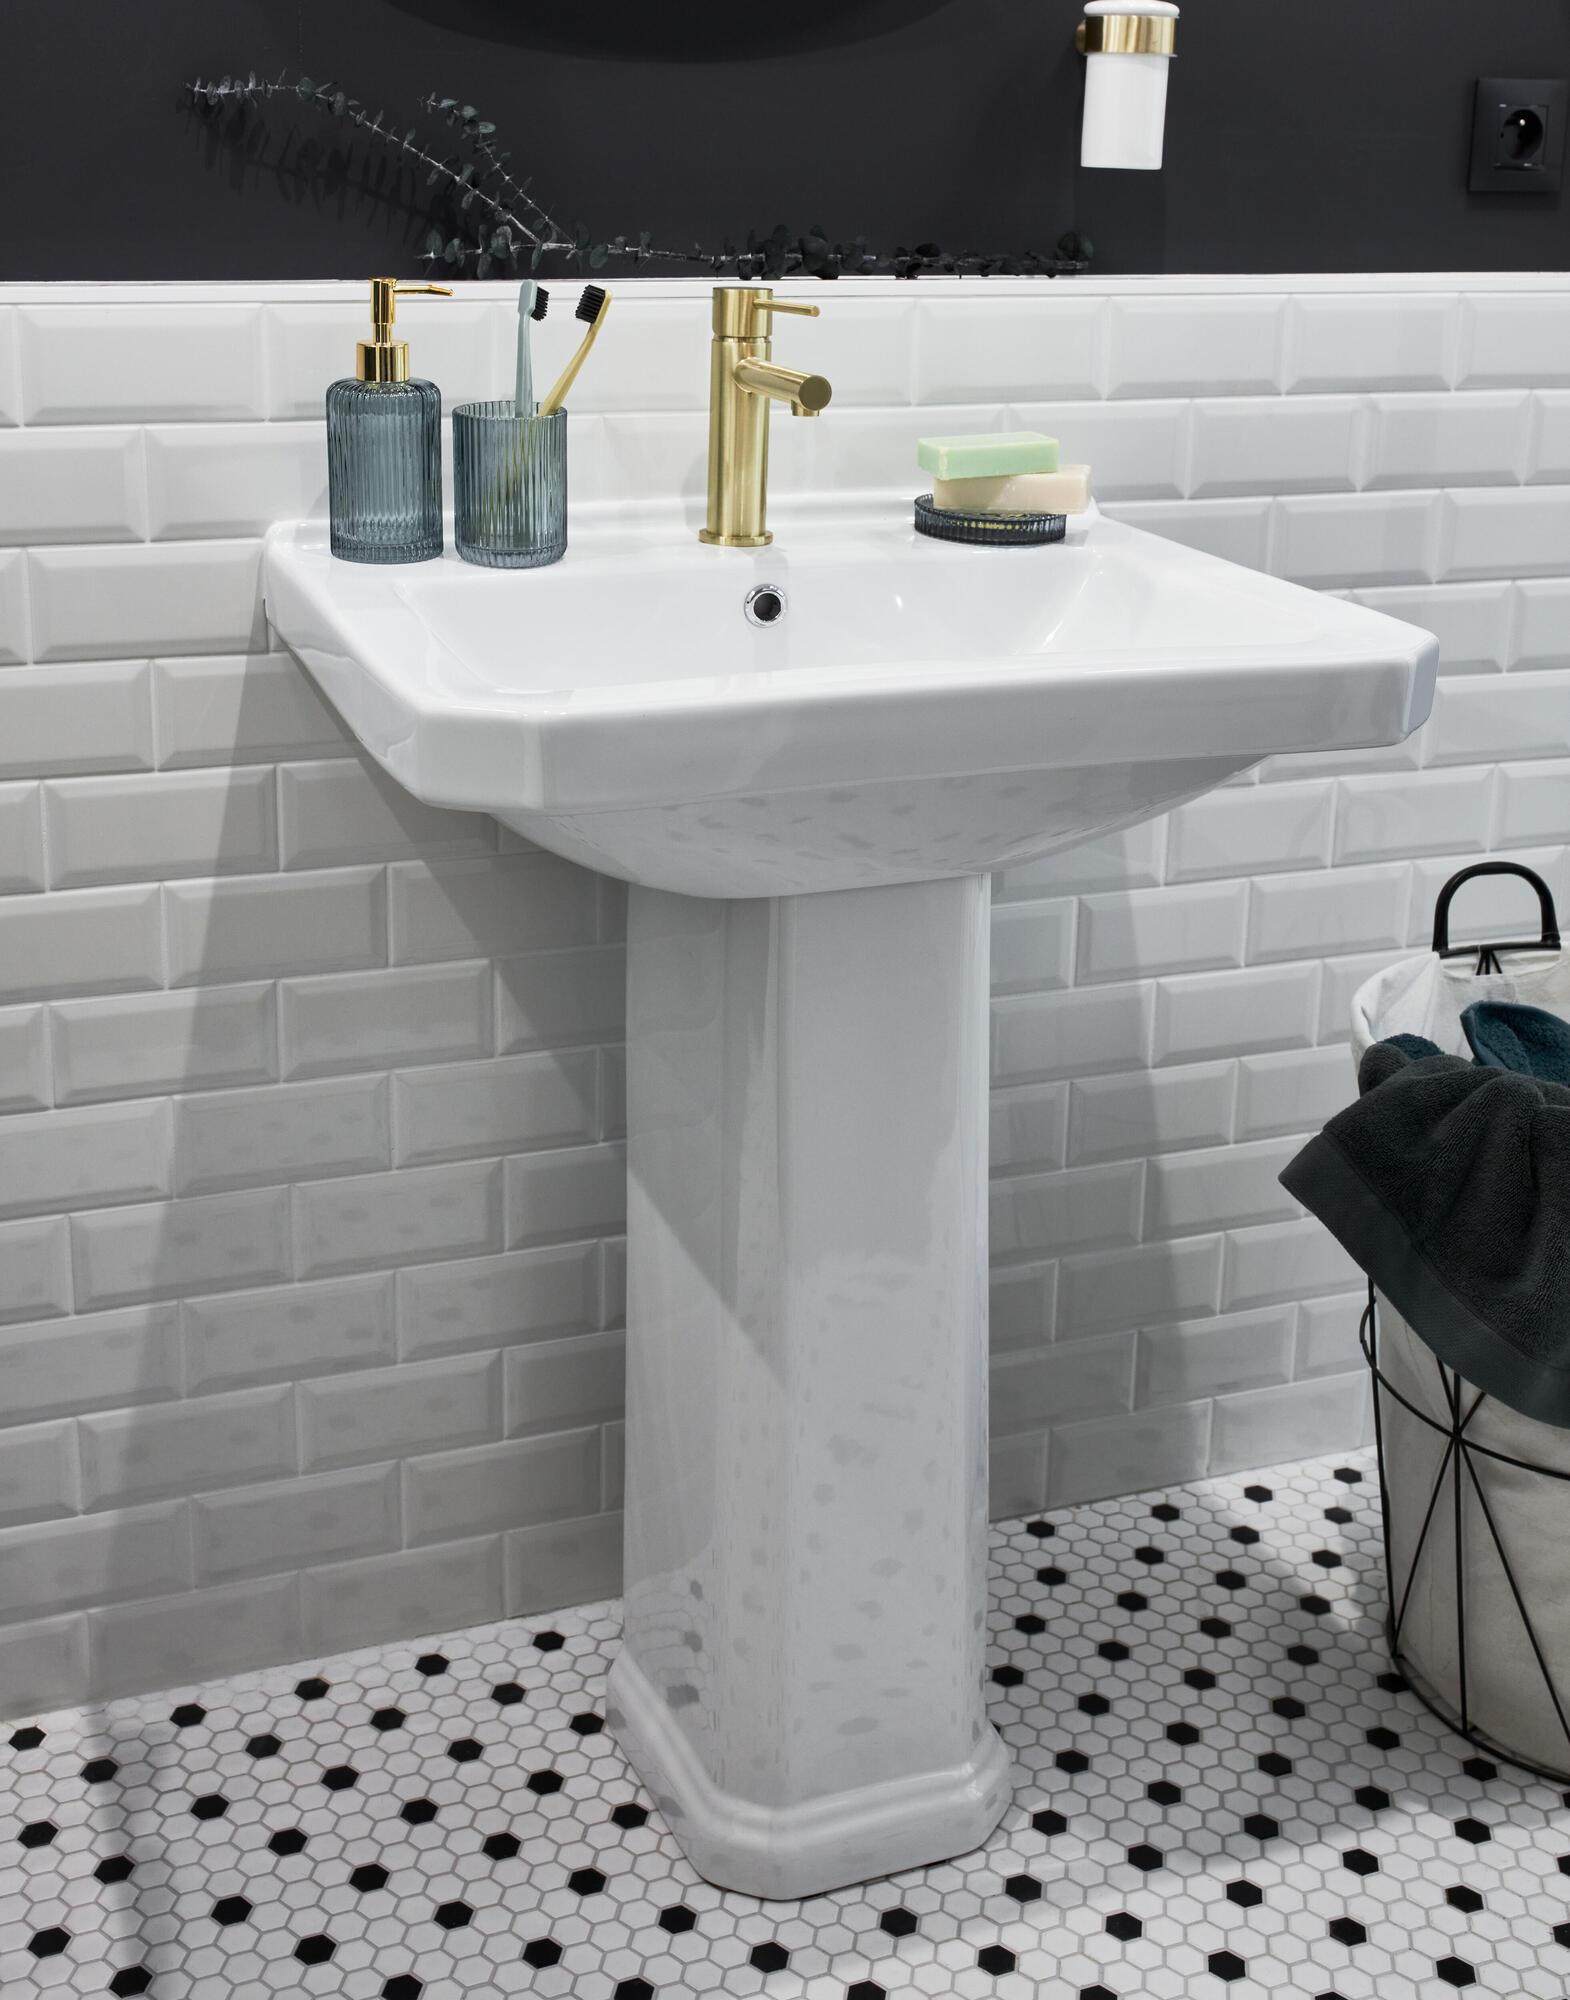 Lavabo quadrato L 43 x P 39.5 cm in ceramica bianco - 2